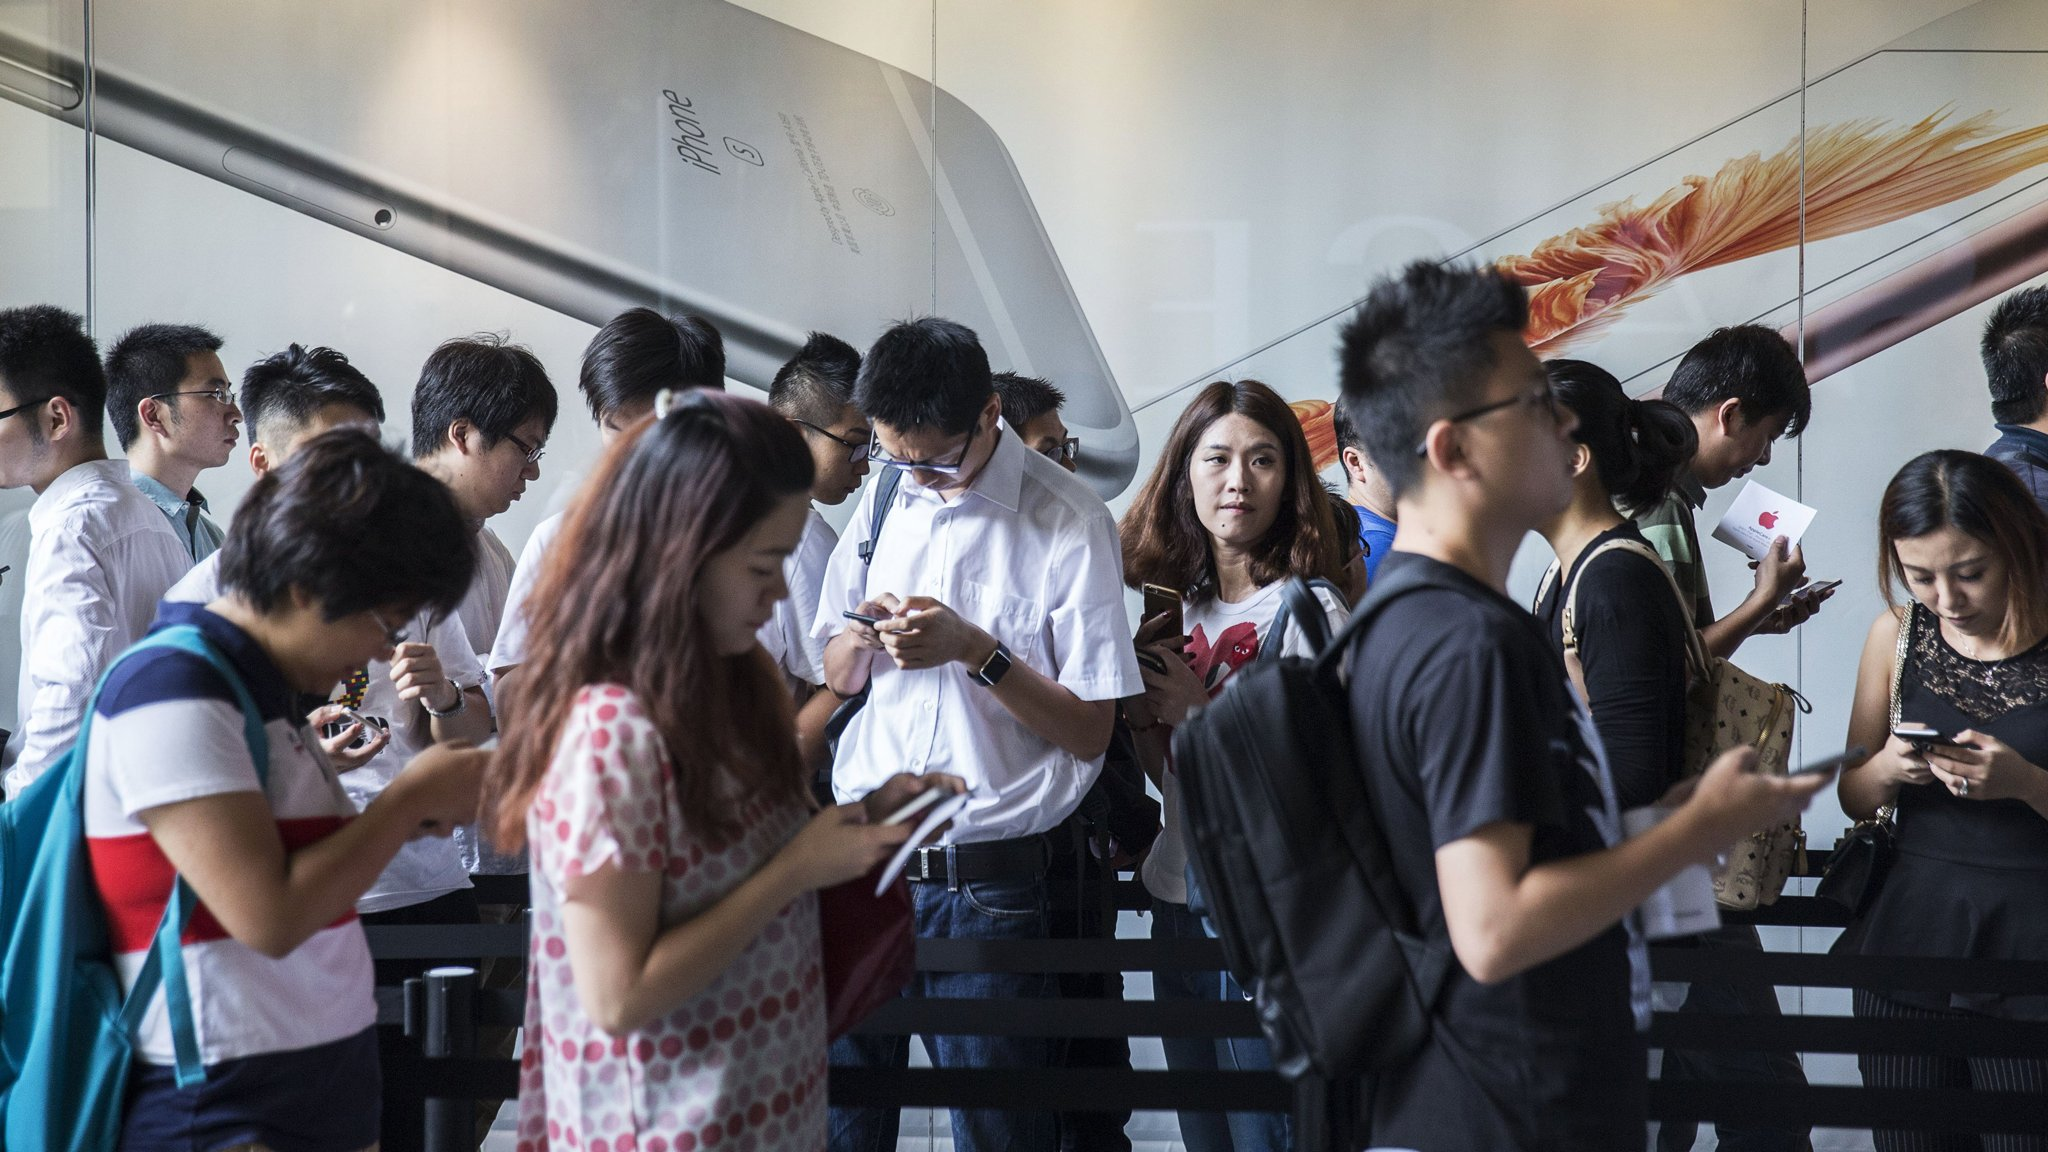 China fintech lending boom fuels risks of data theft